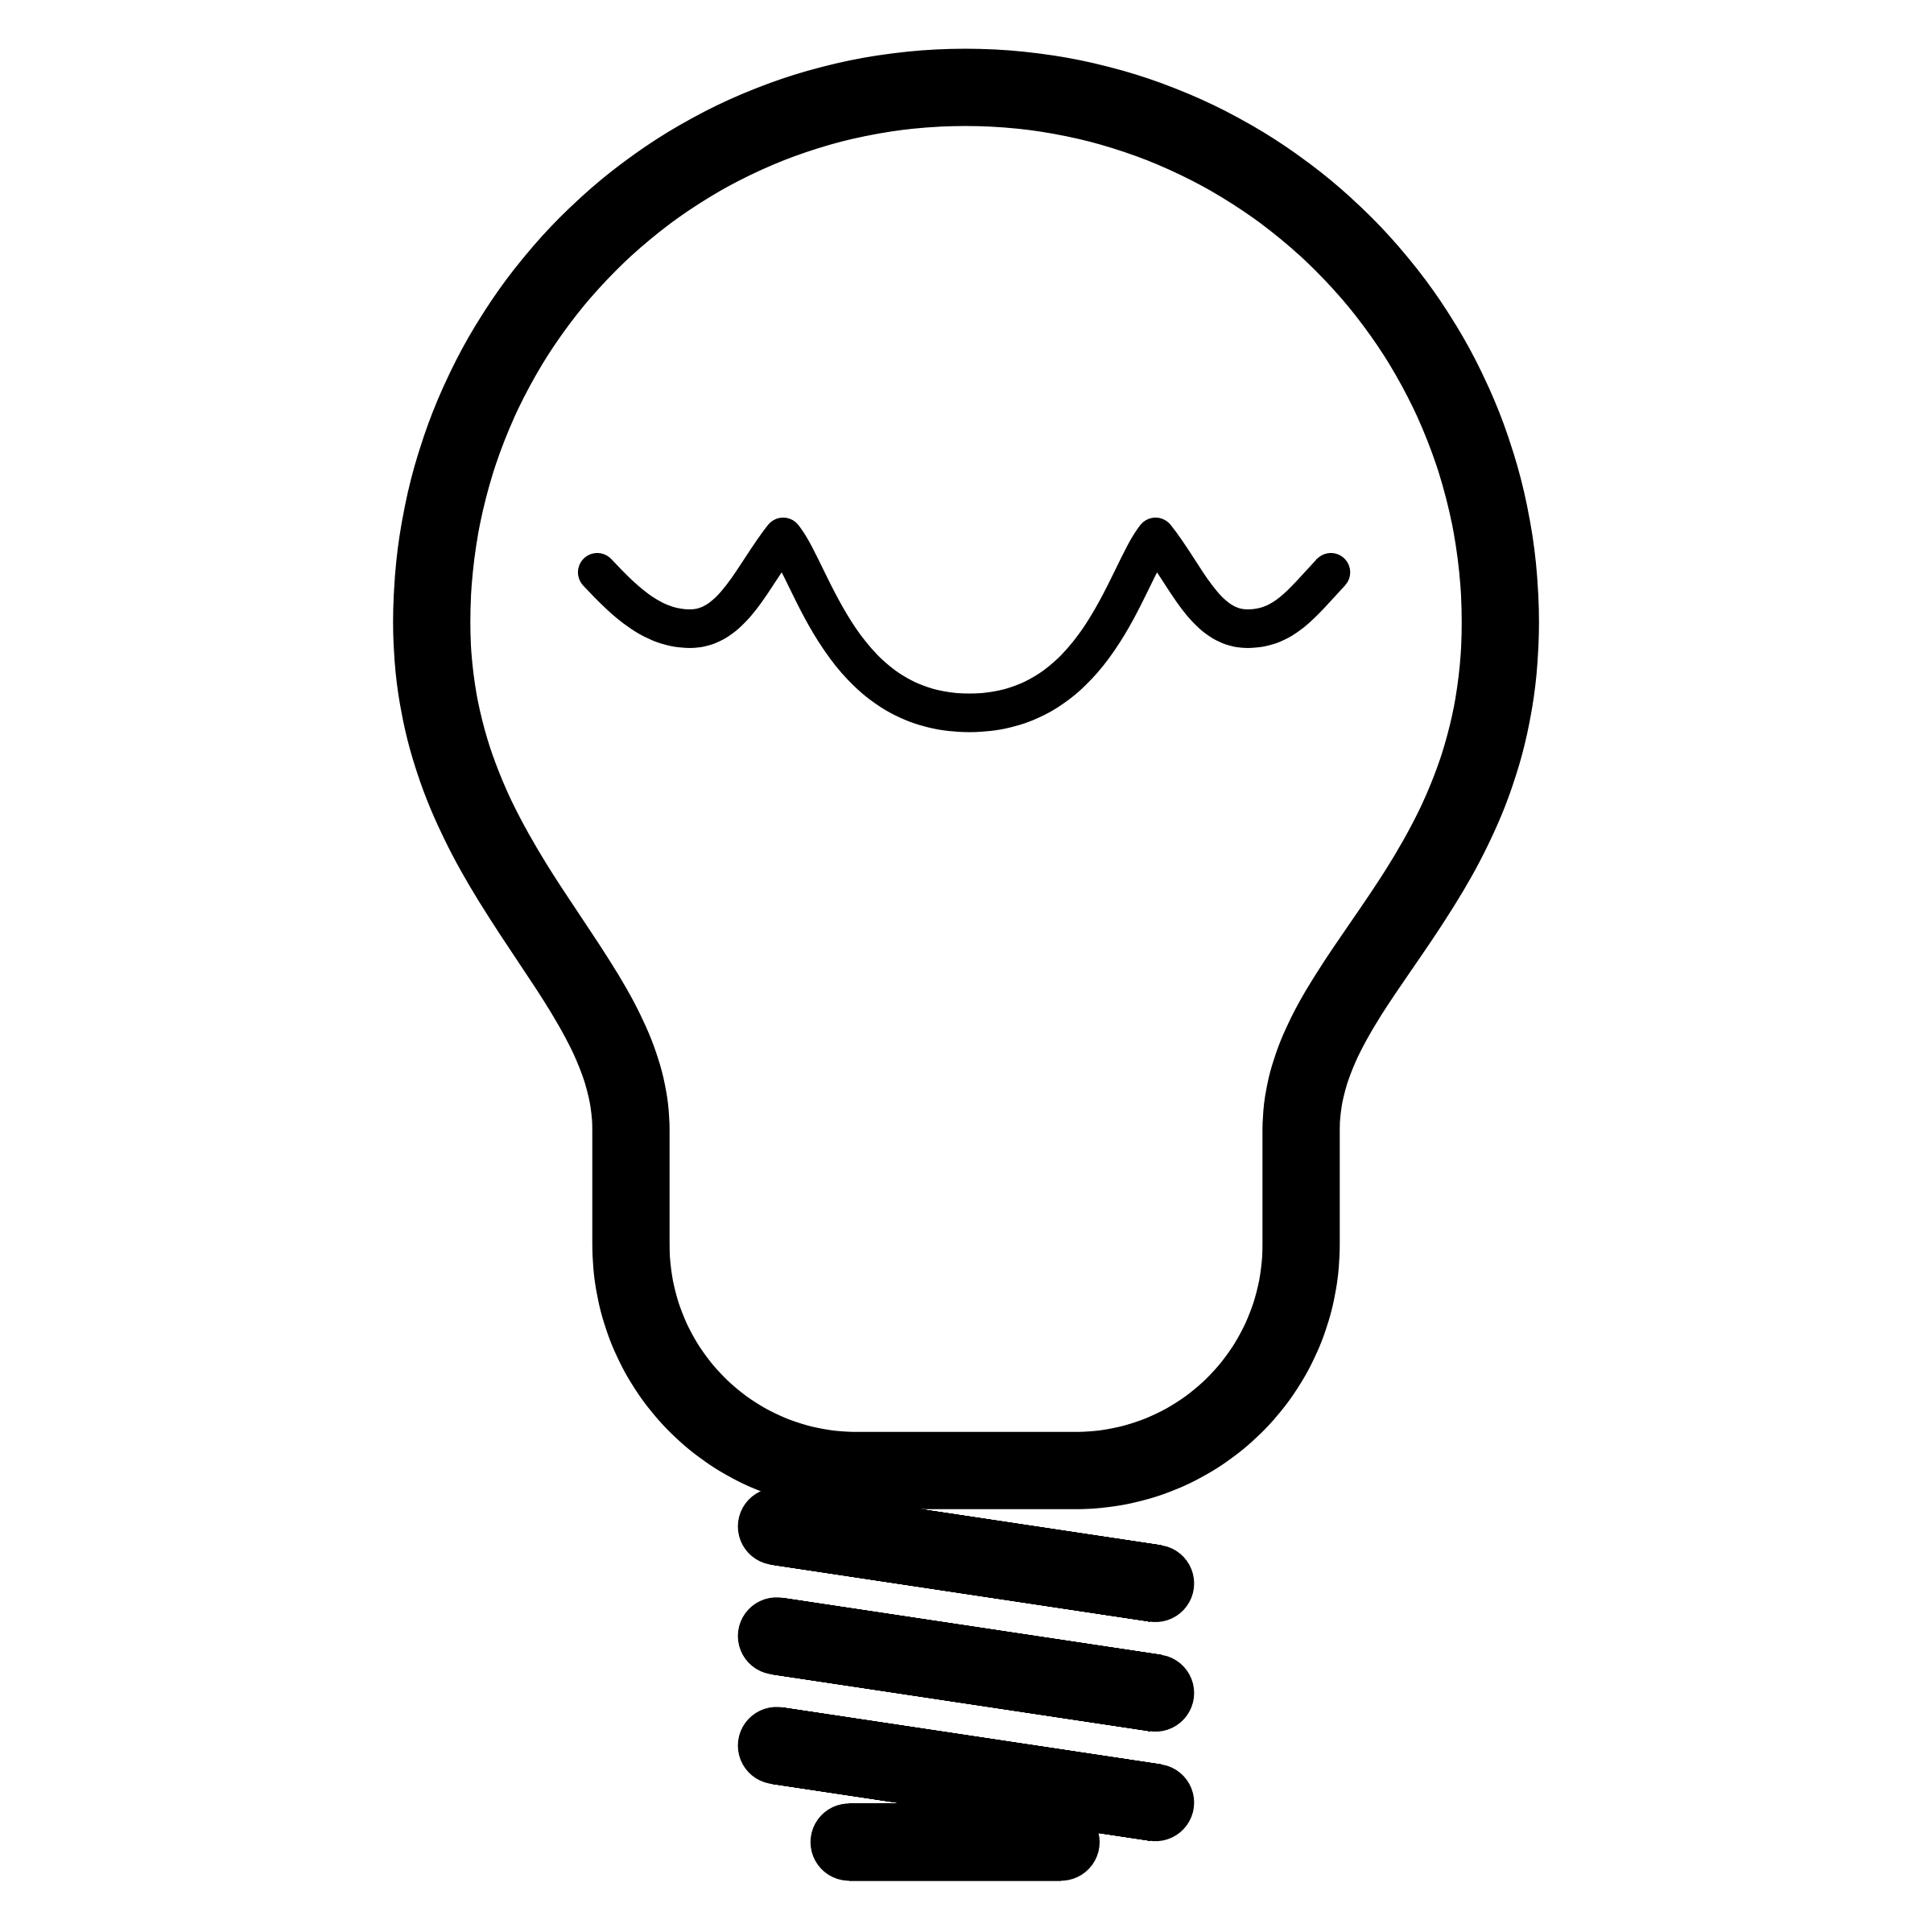 2400x2400 Bulb Clipart Main Idea